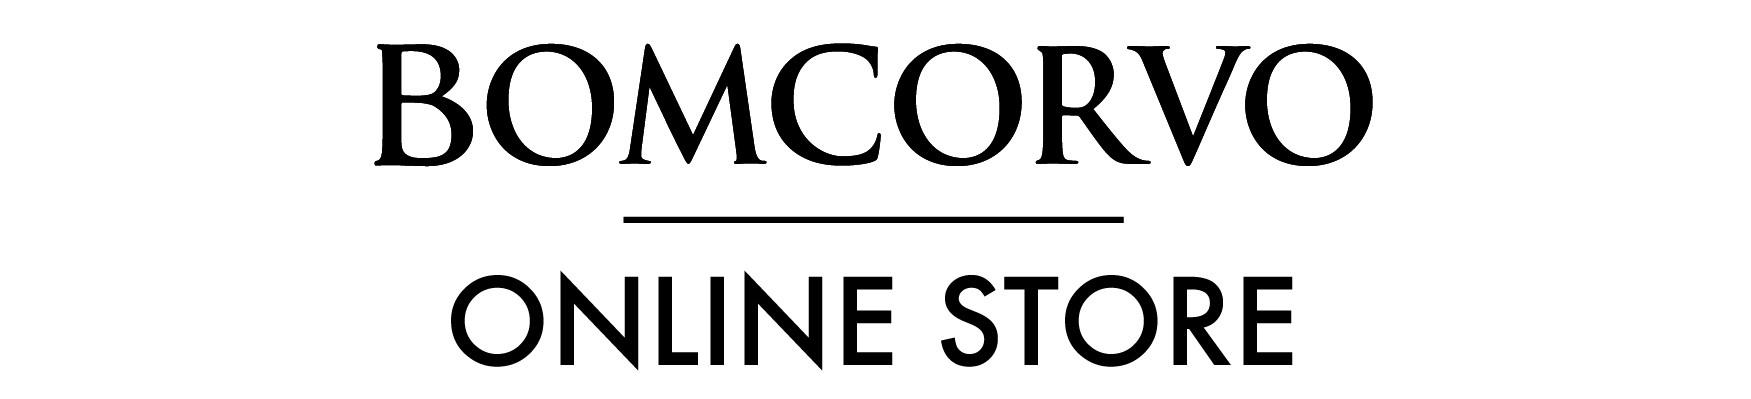 BOMCORVO ONLINE STORE